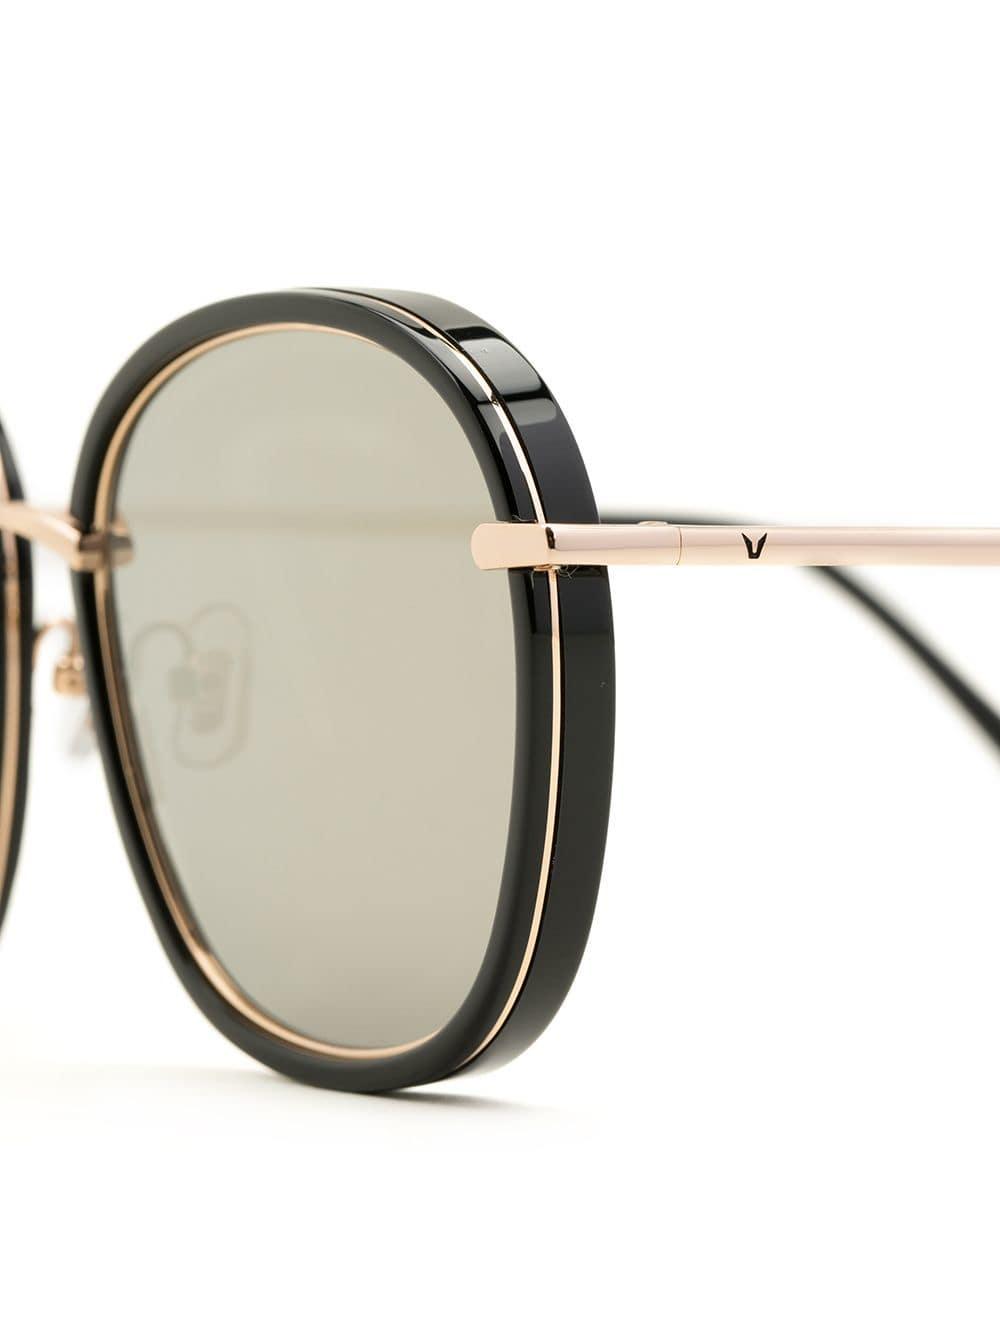 0538c1cfb88 Gentle Monster - Black Mad Crush Sunglasses - Lyst. View fullscreen